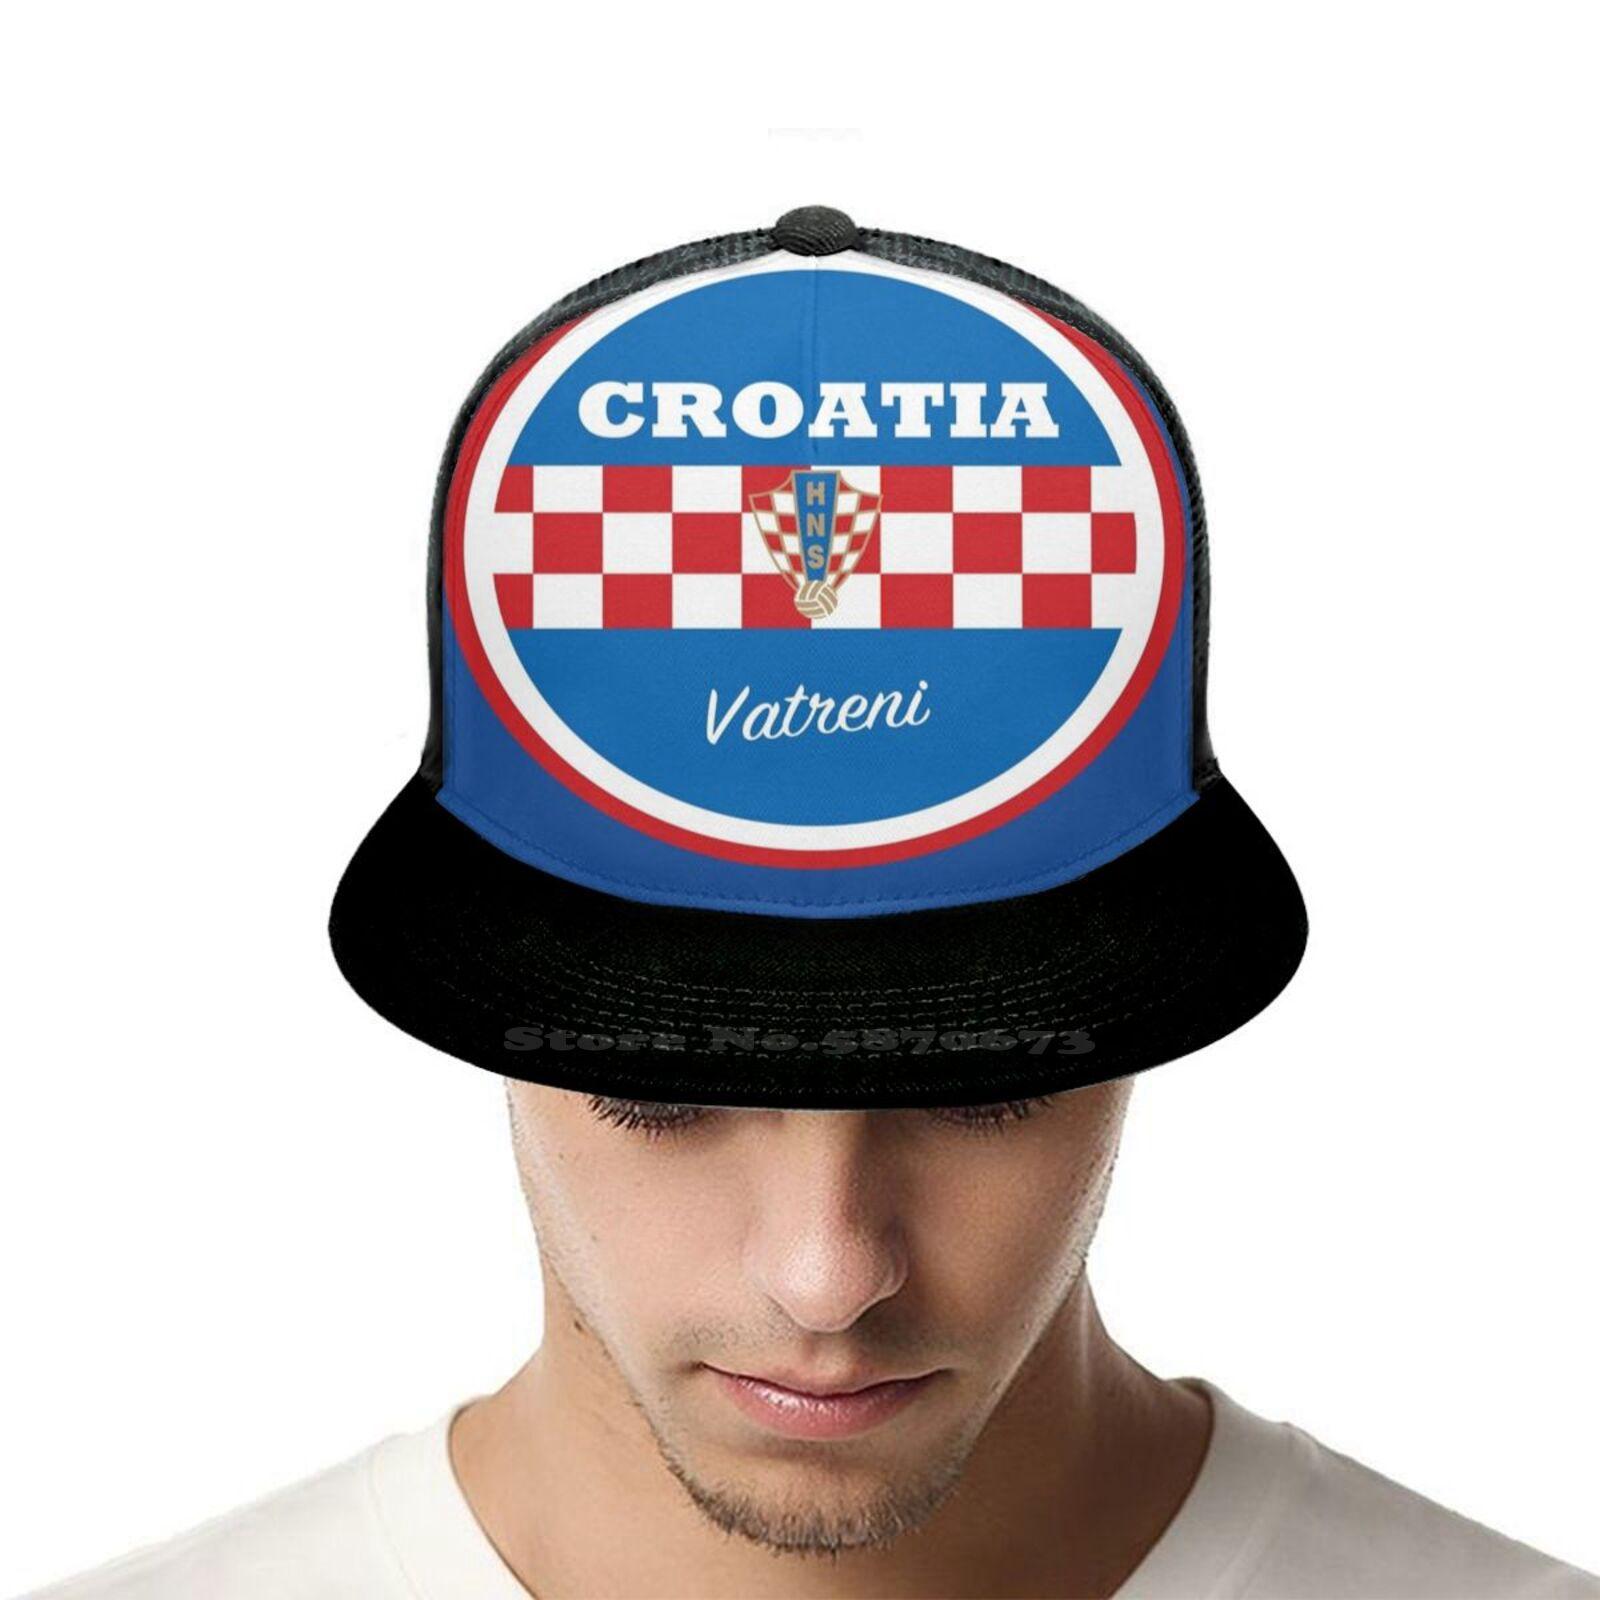 Croatia Baseball Hat For Outdoor Sports Cap Fifa World Cup Football Brazil V Germany Soccer Goals Final Goal South Africa